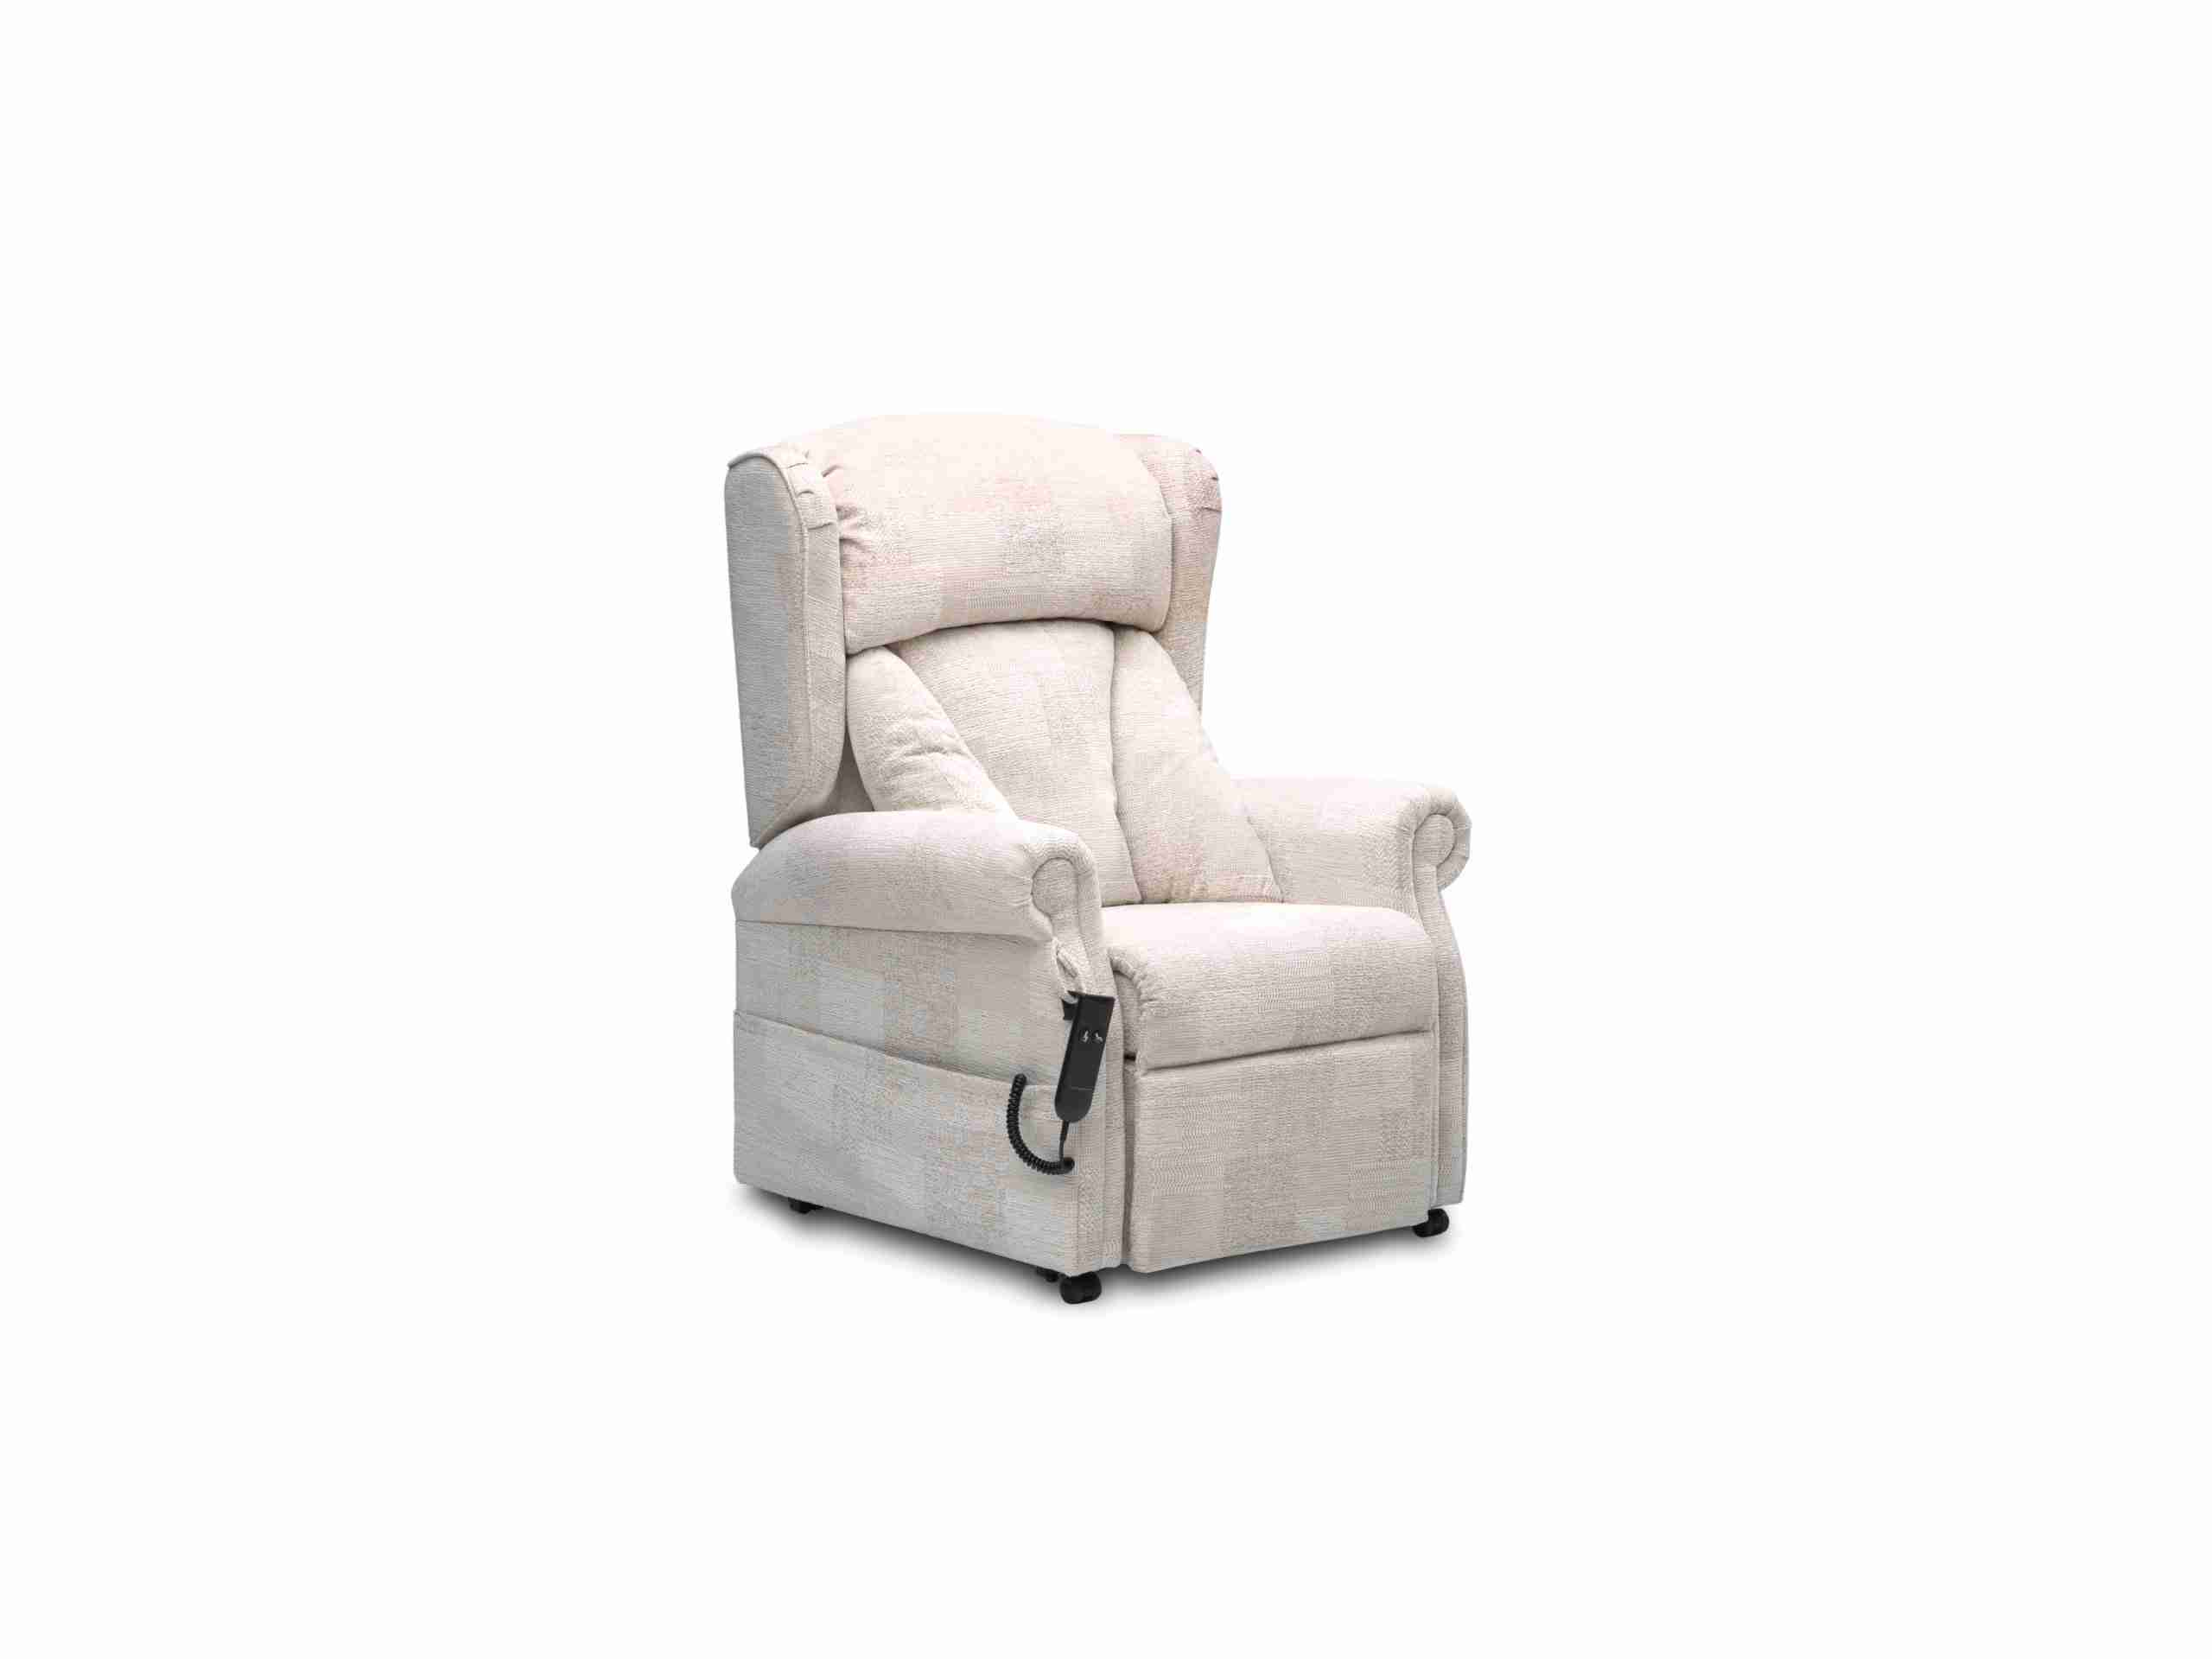 Chepstow Chair Repose02